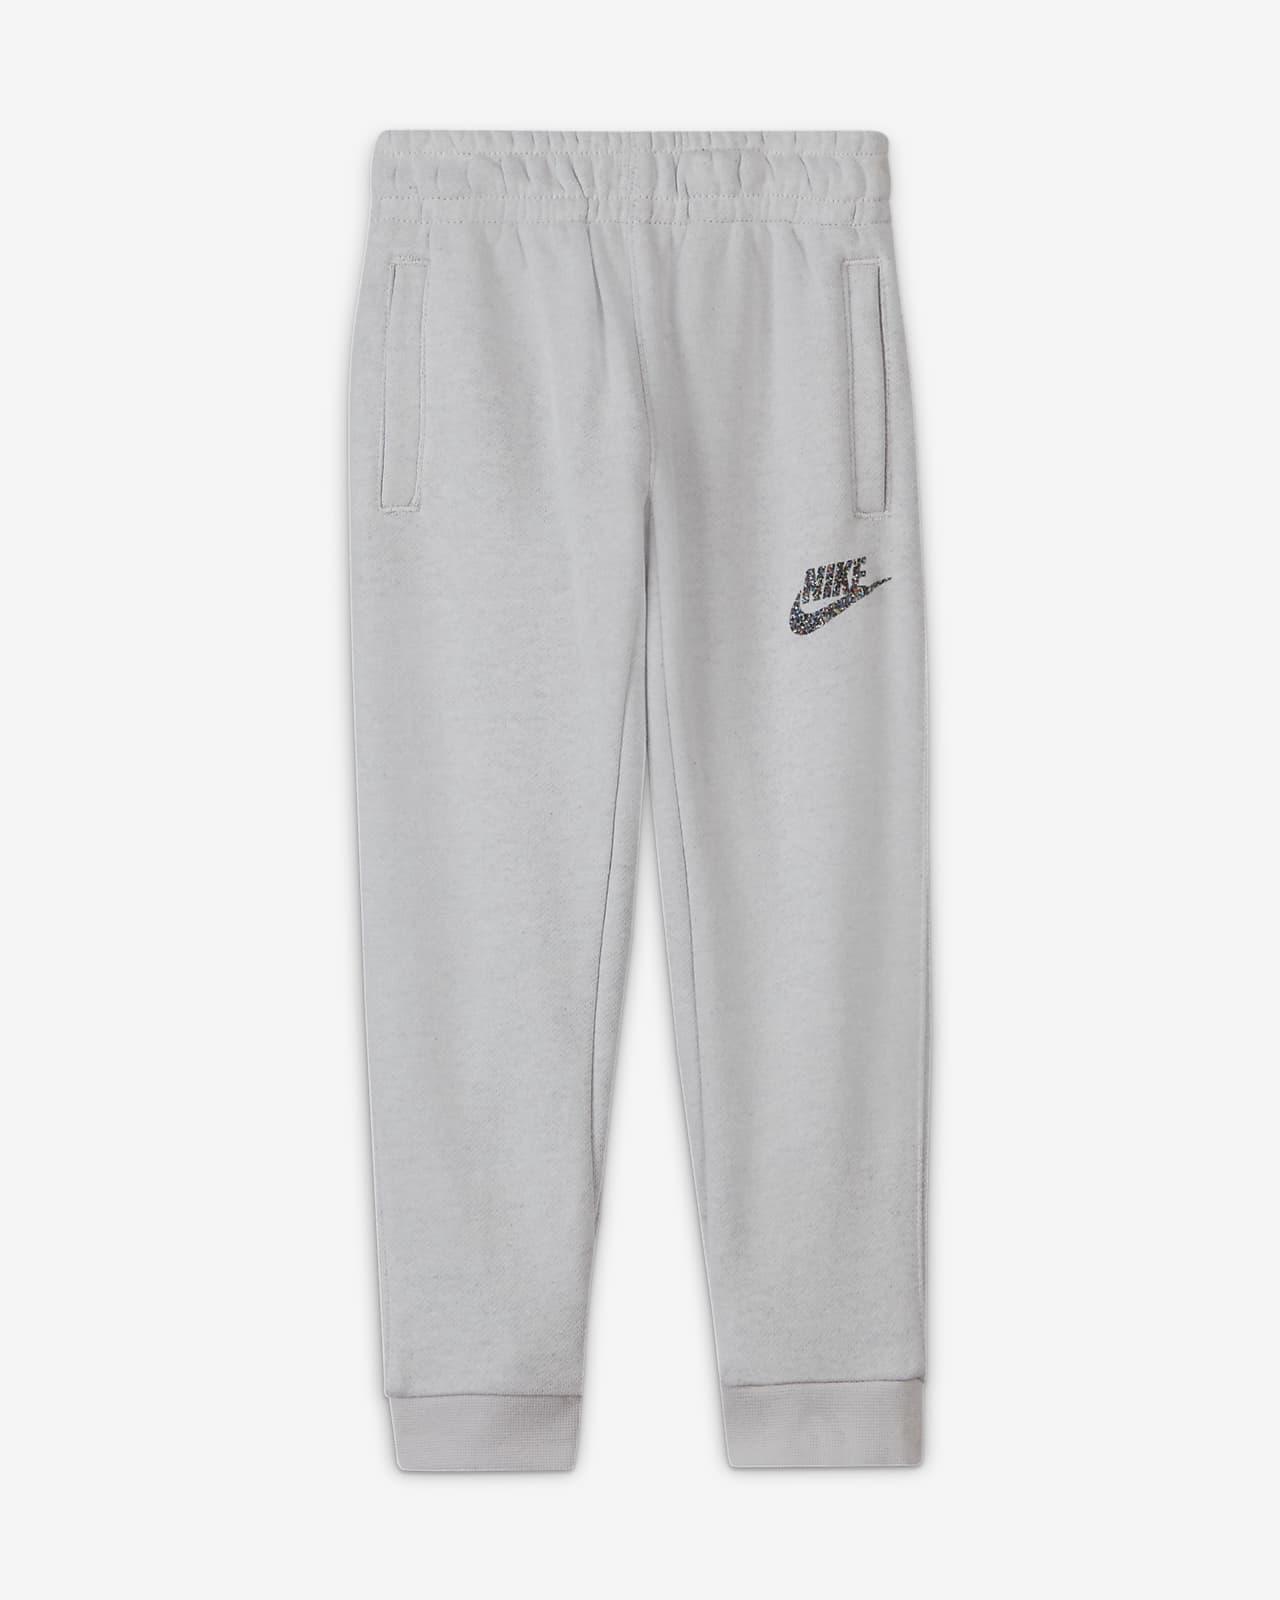 Pantalon Nike pour Petit enfant